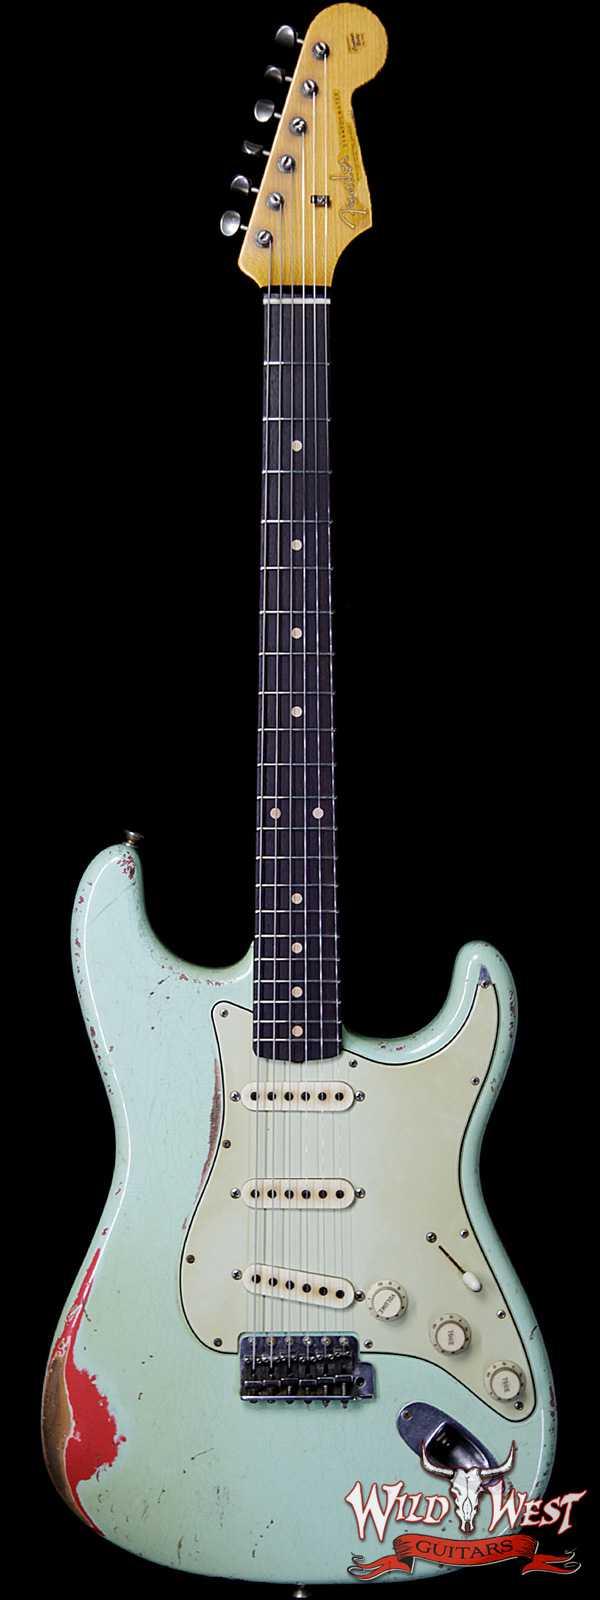 Fender Custom Shop John Cruz Masterbuilt 1962 Stratocaster Heavy Relic AAA Rosewood Slab Board Surf Green / Fiesta Red